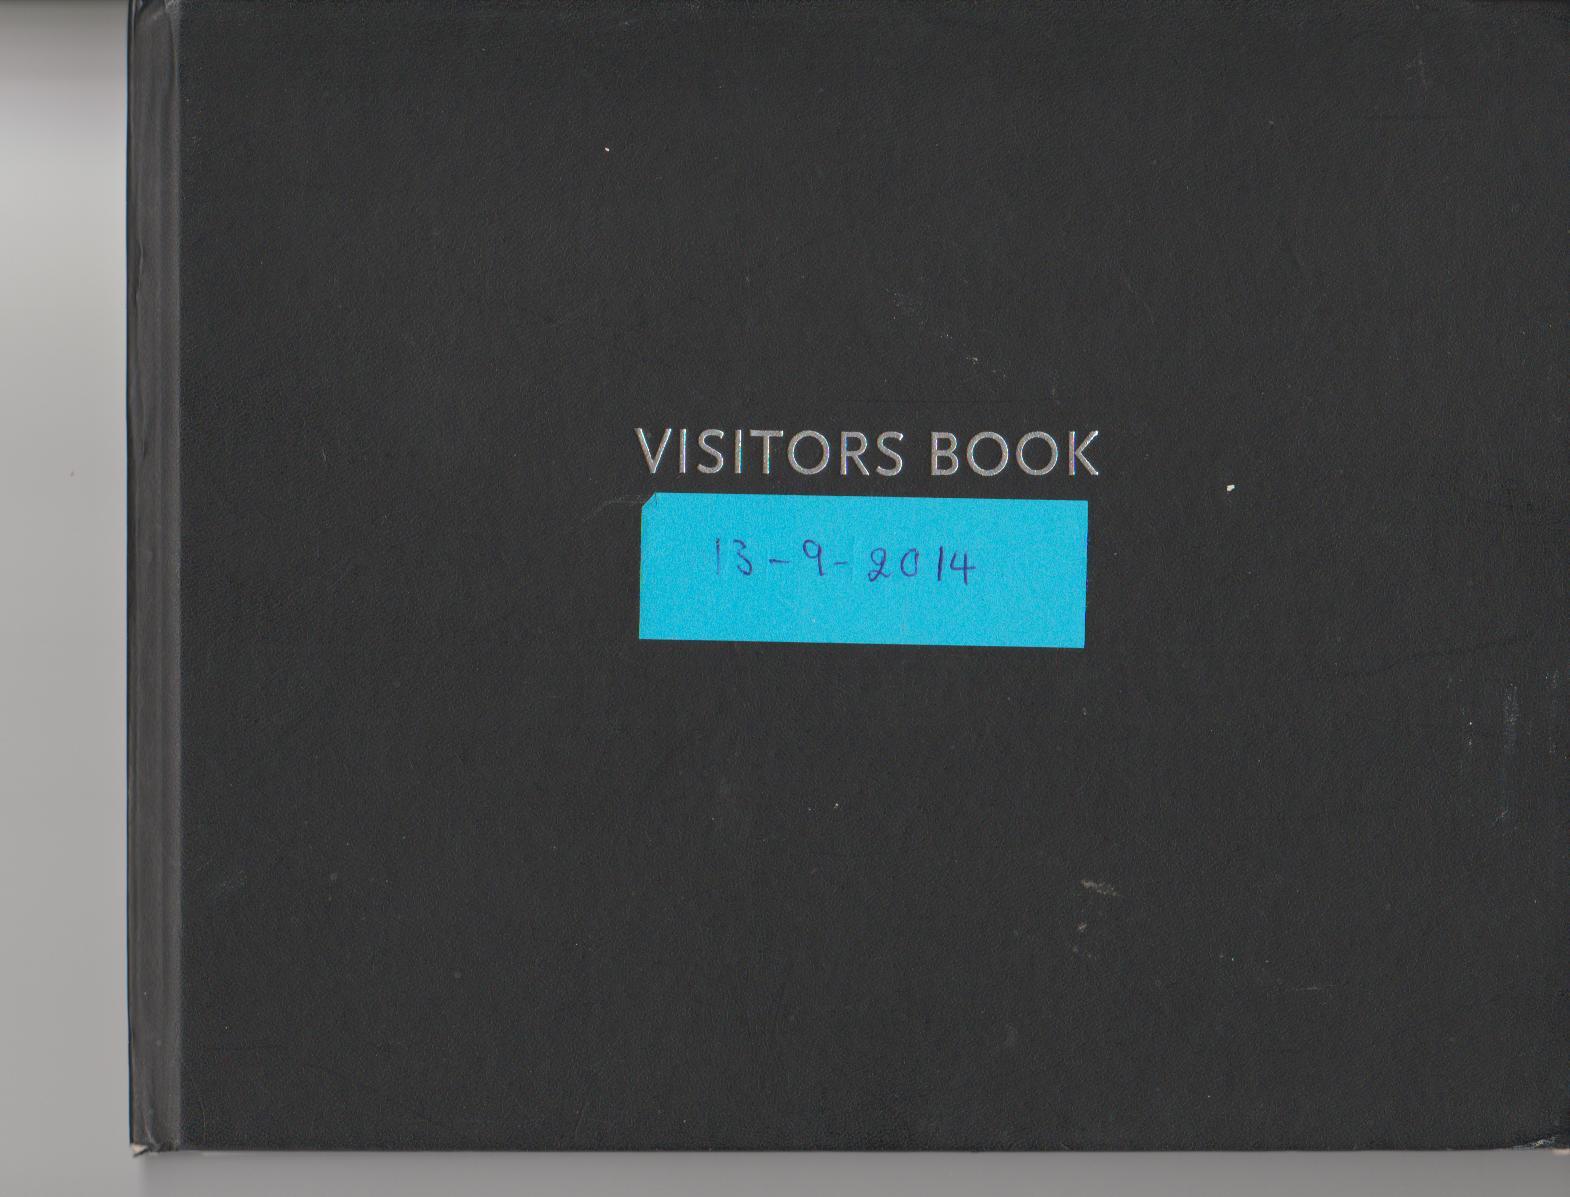 visitor book 13-09-2014